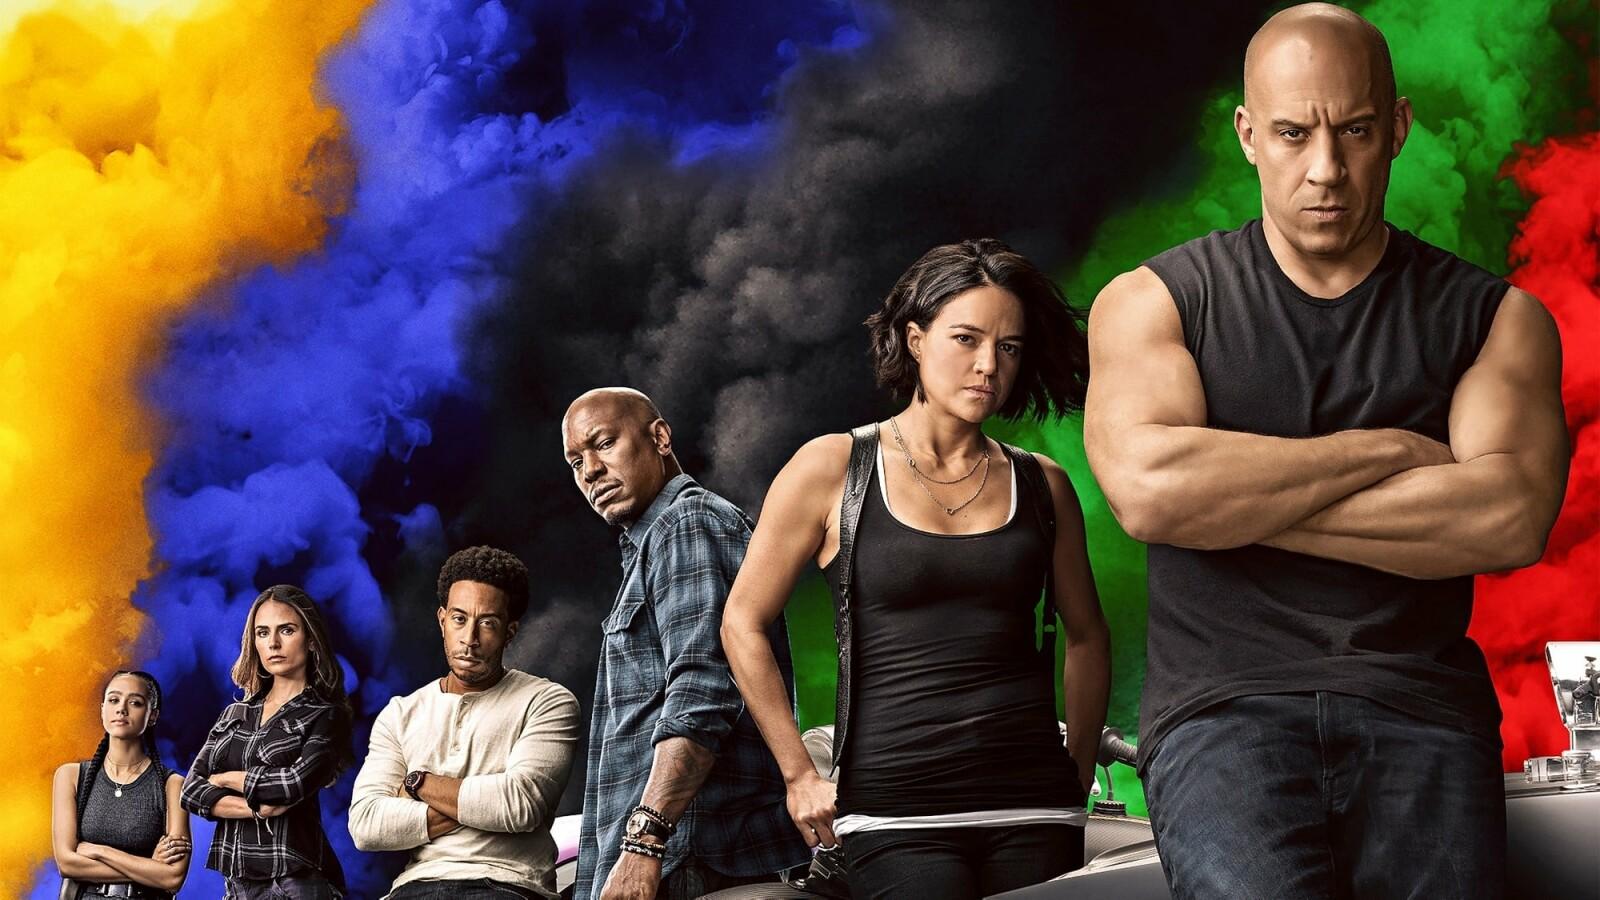 Fast & Furious: Actionreihe nimmt bald ein Ende